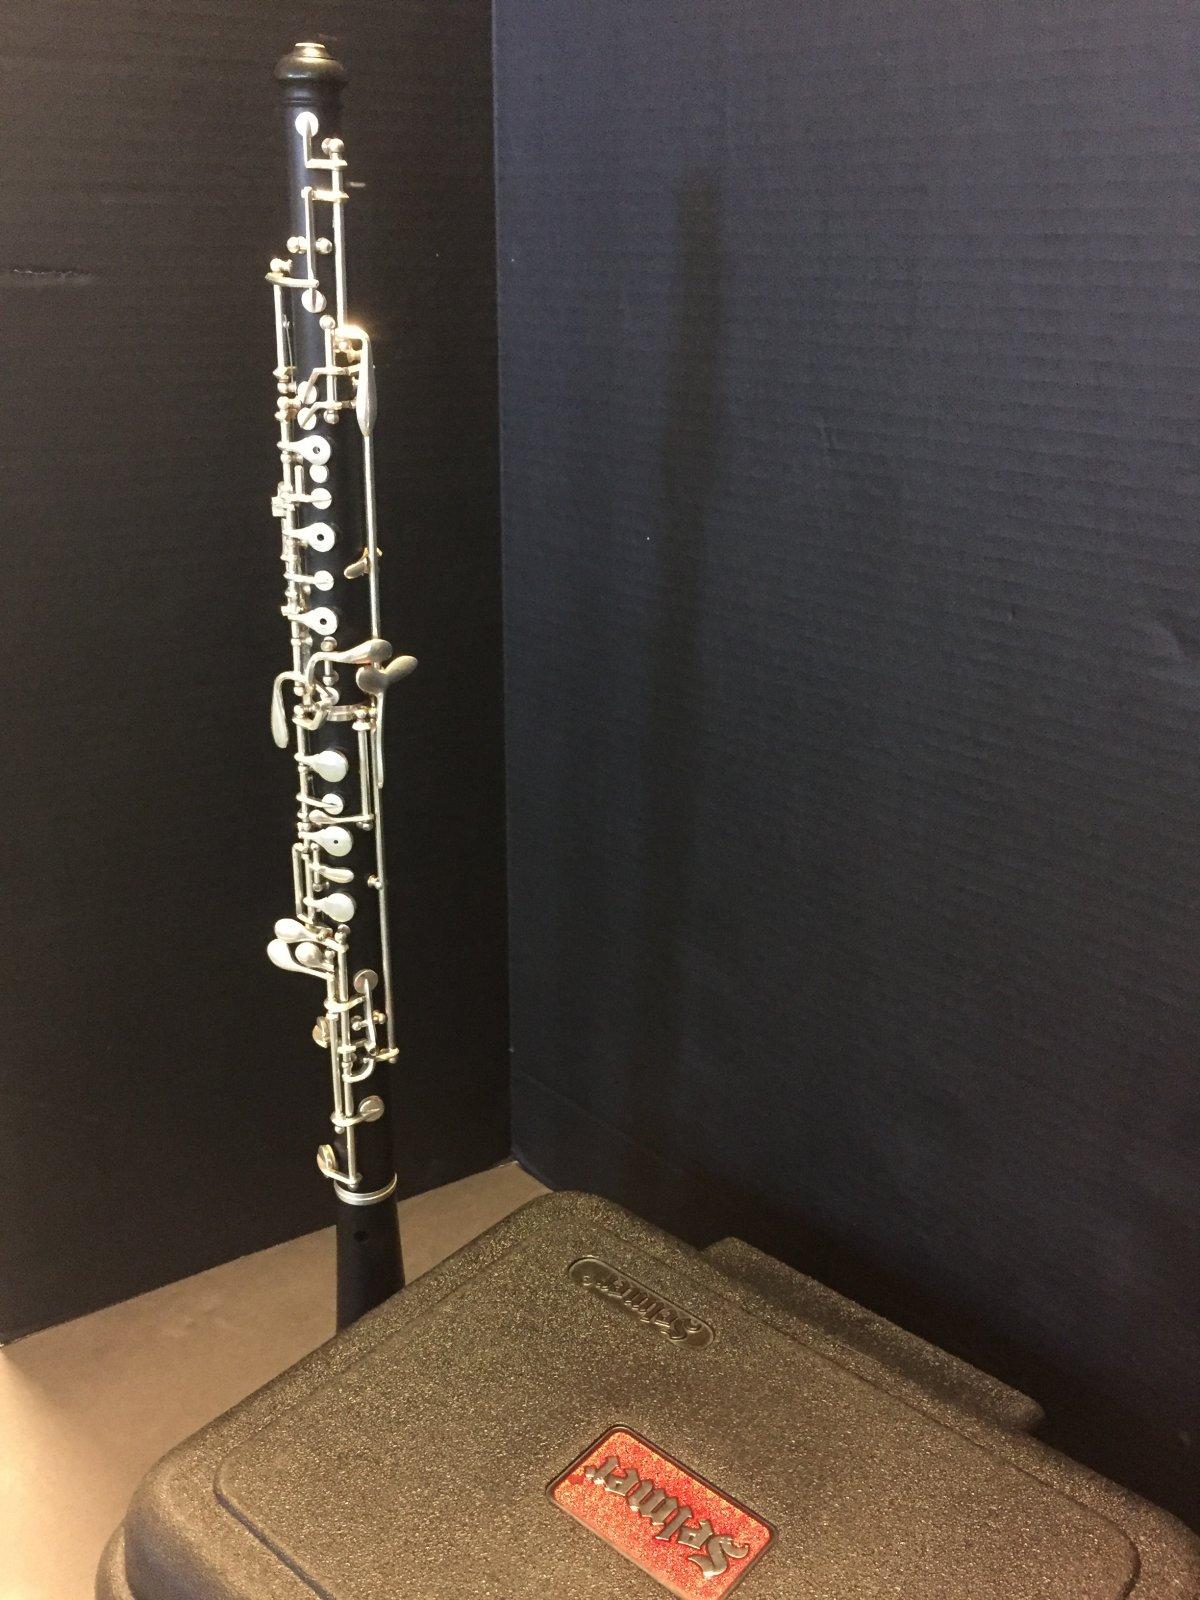 Selmer 1492 Student Oboe